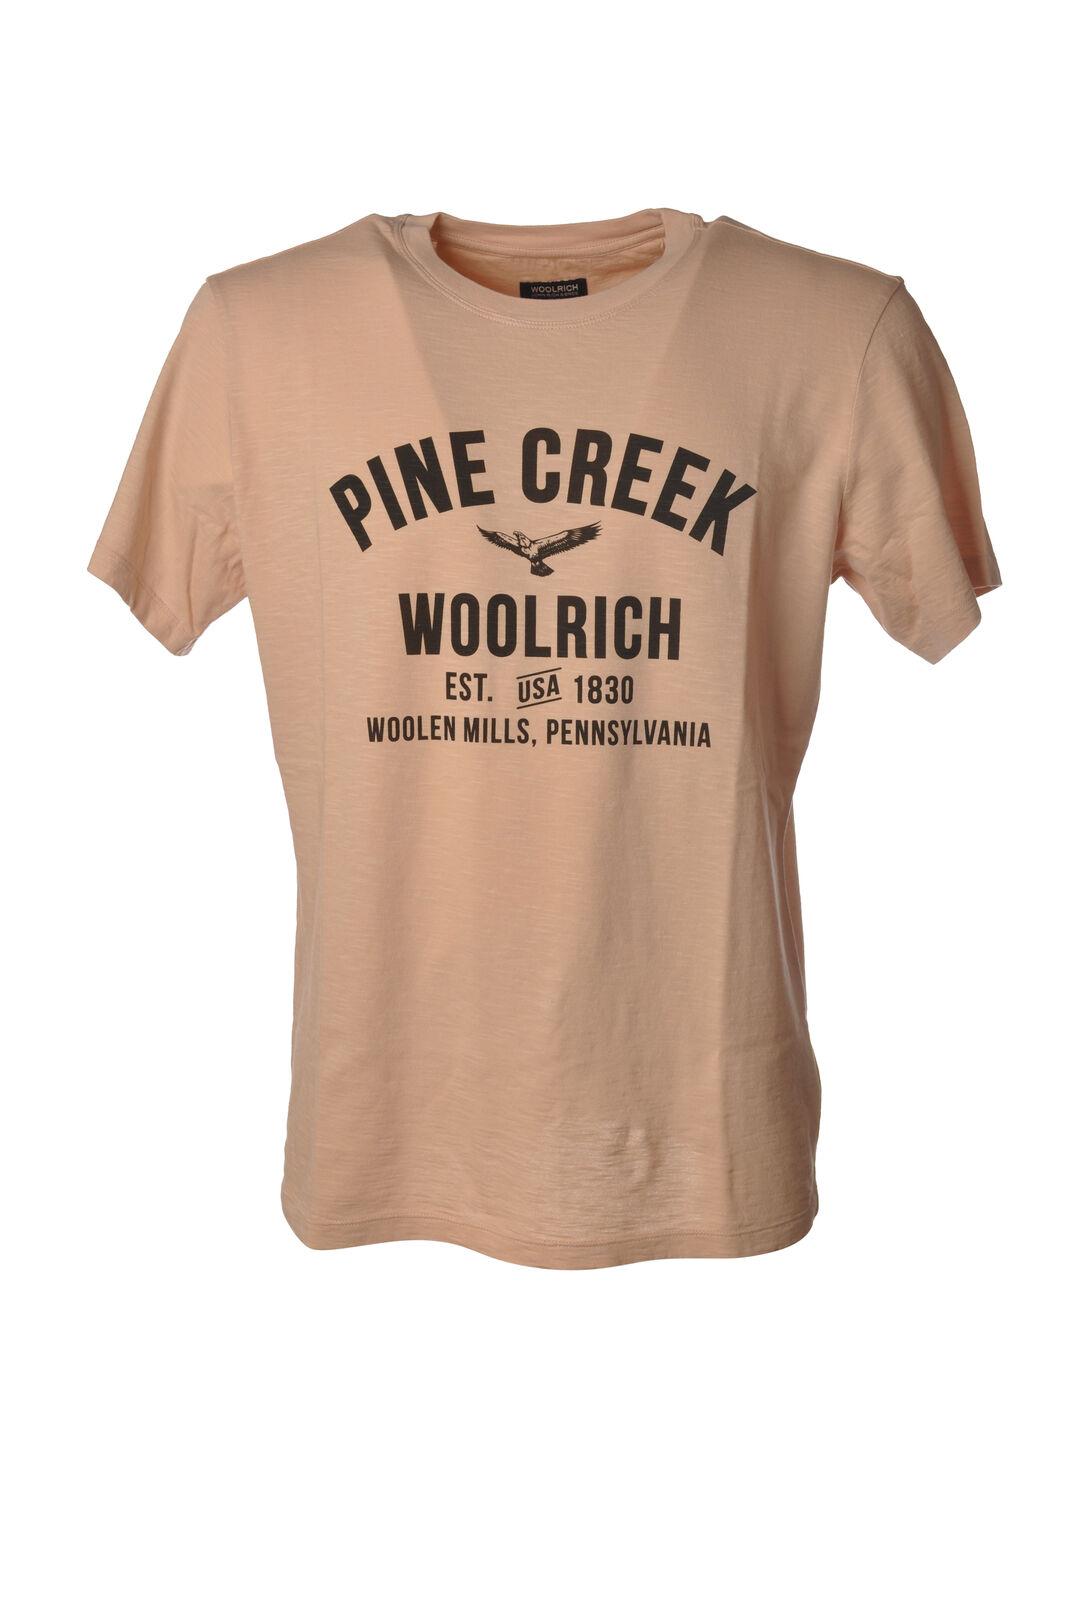 Woolrich - Topwear-T-shirts - Man - Pink - 6067003E191032